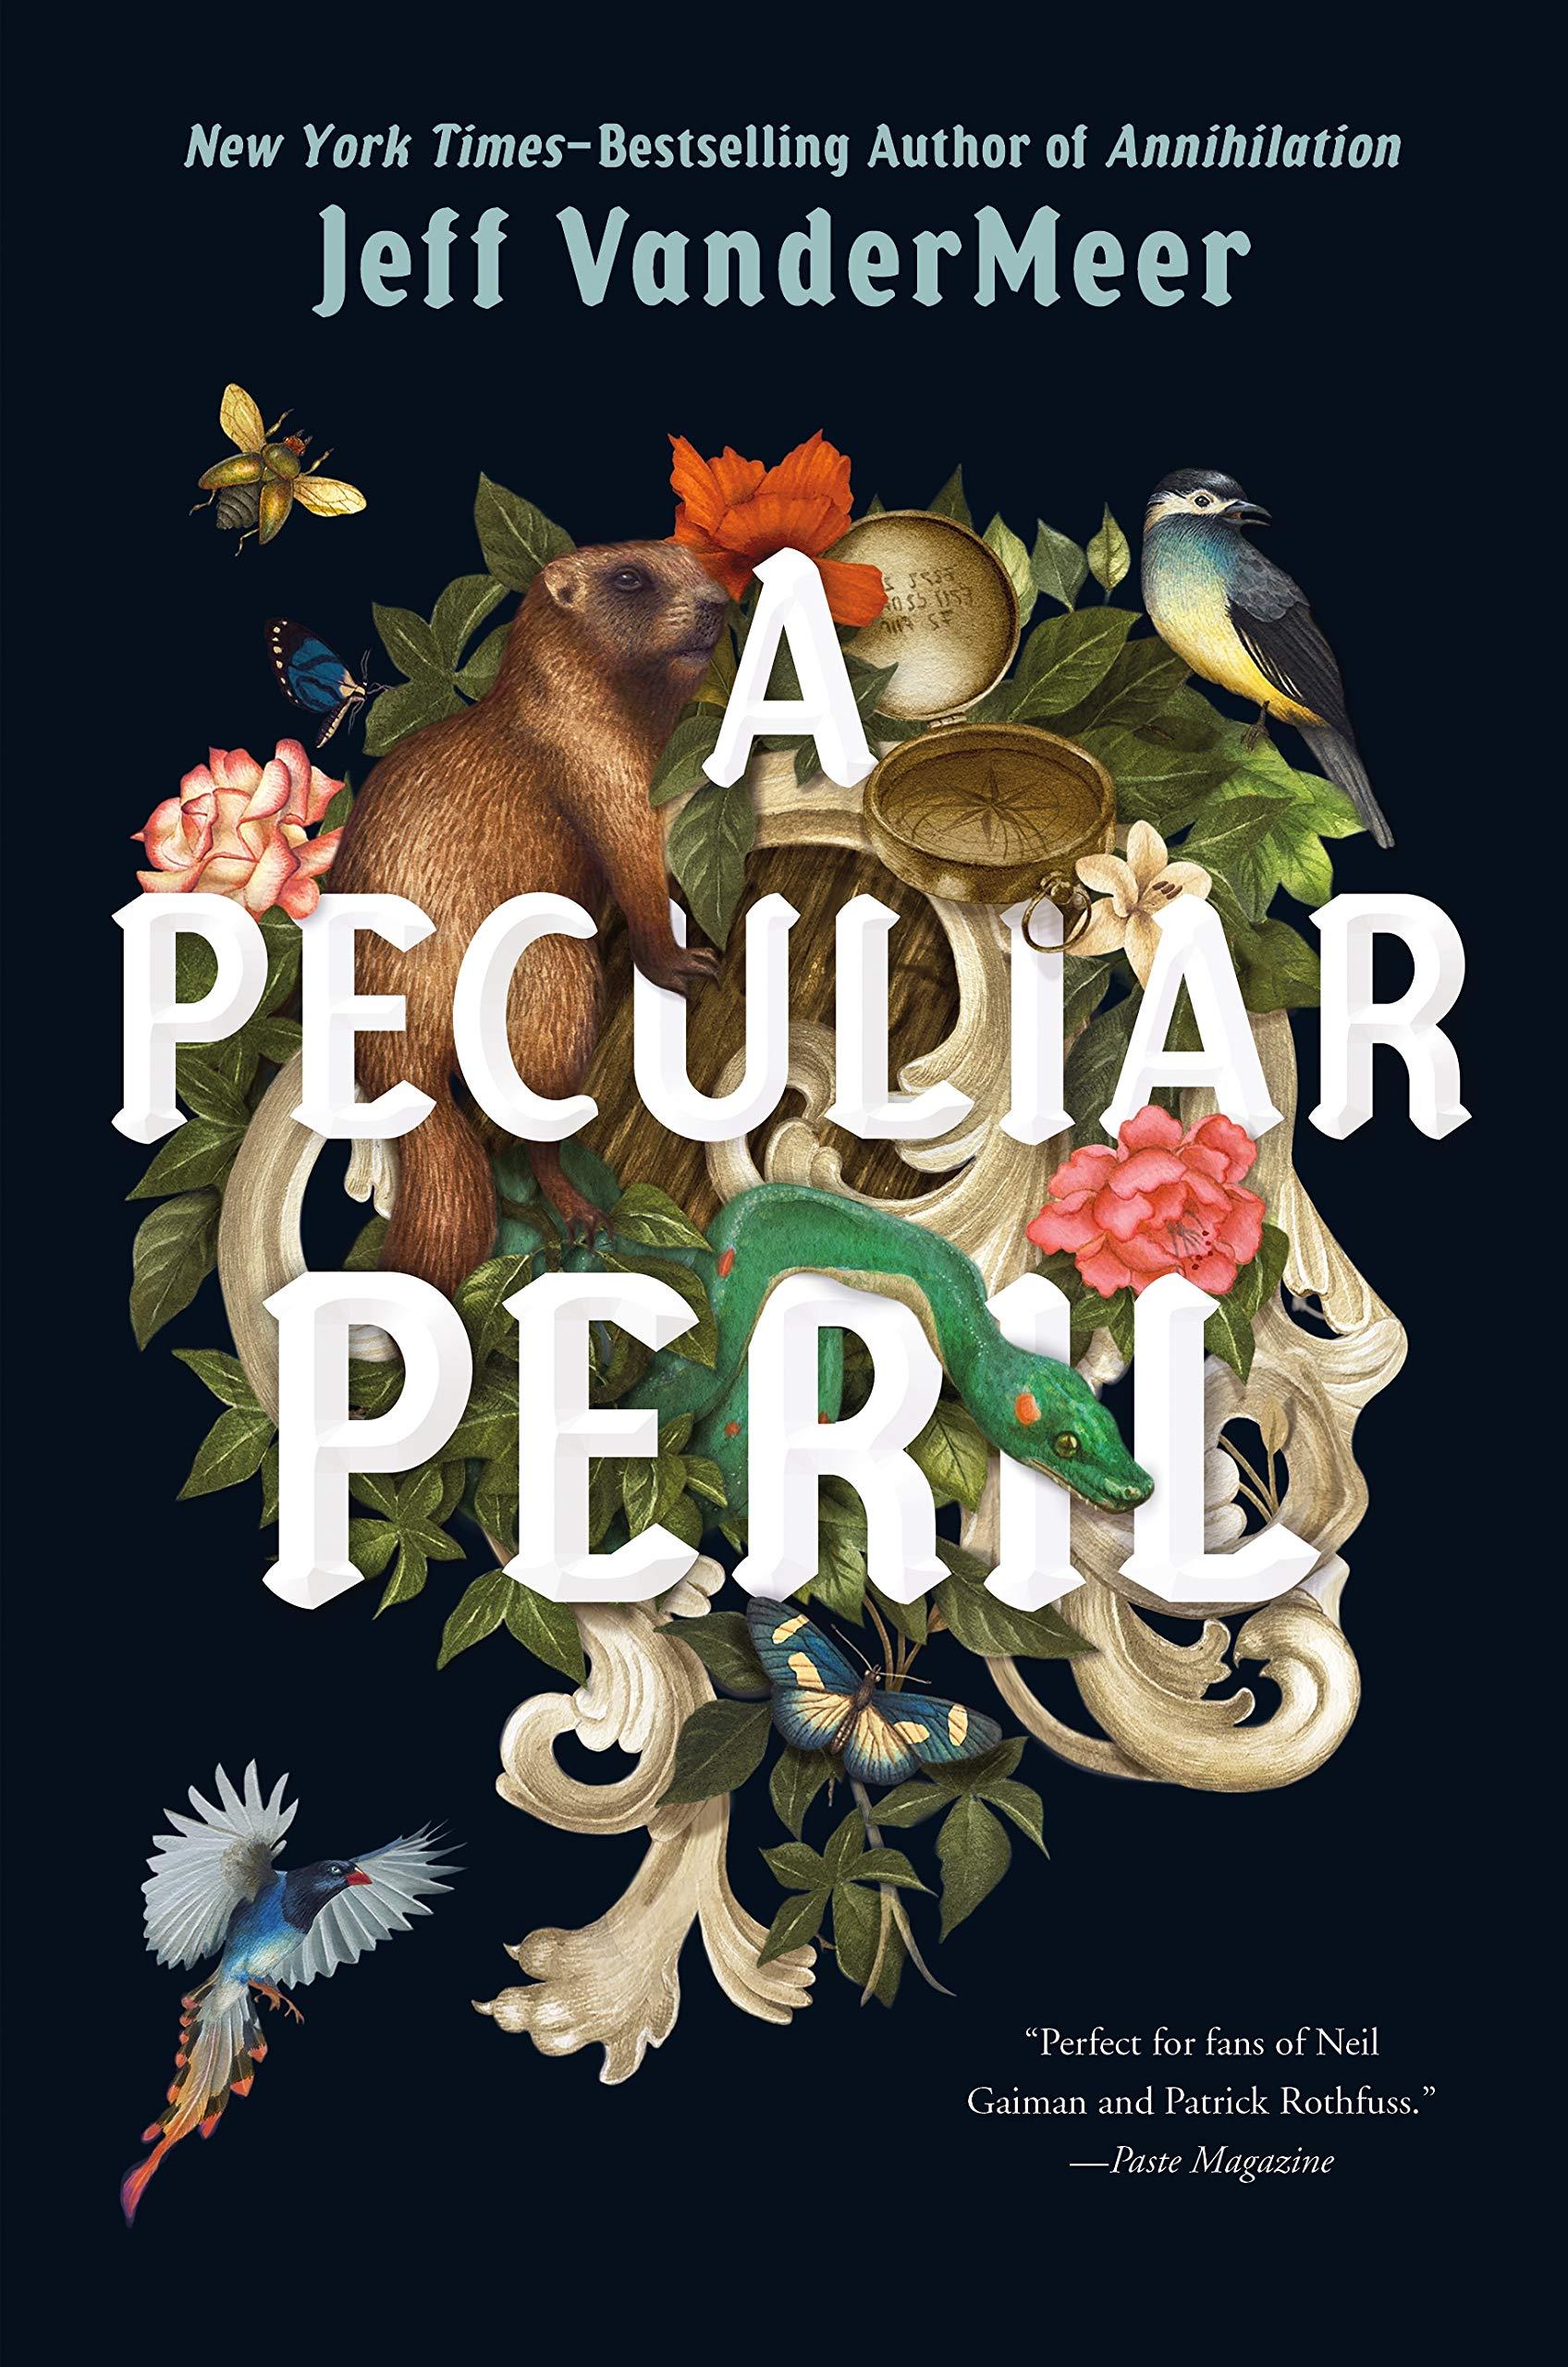 A Peculiar Peril: Amazon.it: Vandermeer, Jeff, Zerfoss, Jeremy: Libri in  altre lingue